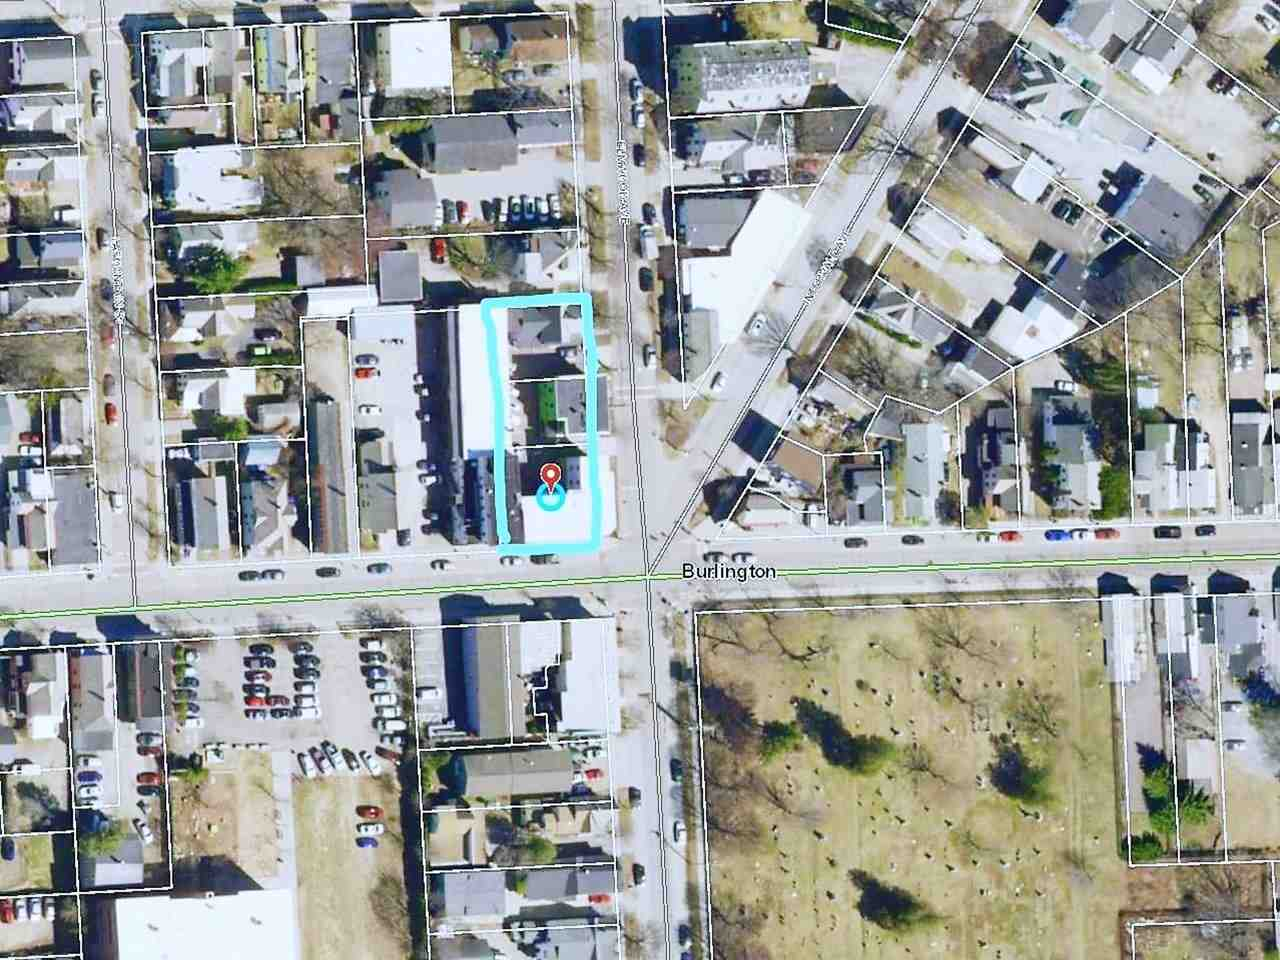 Photo of 200 North St. & 161-167 Elmwood Ave. Burlington VT 05401